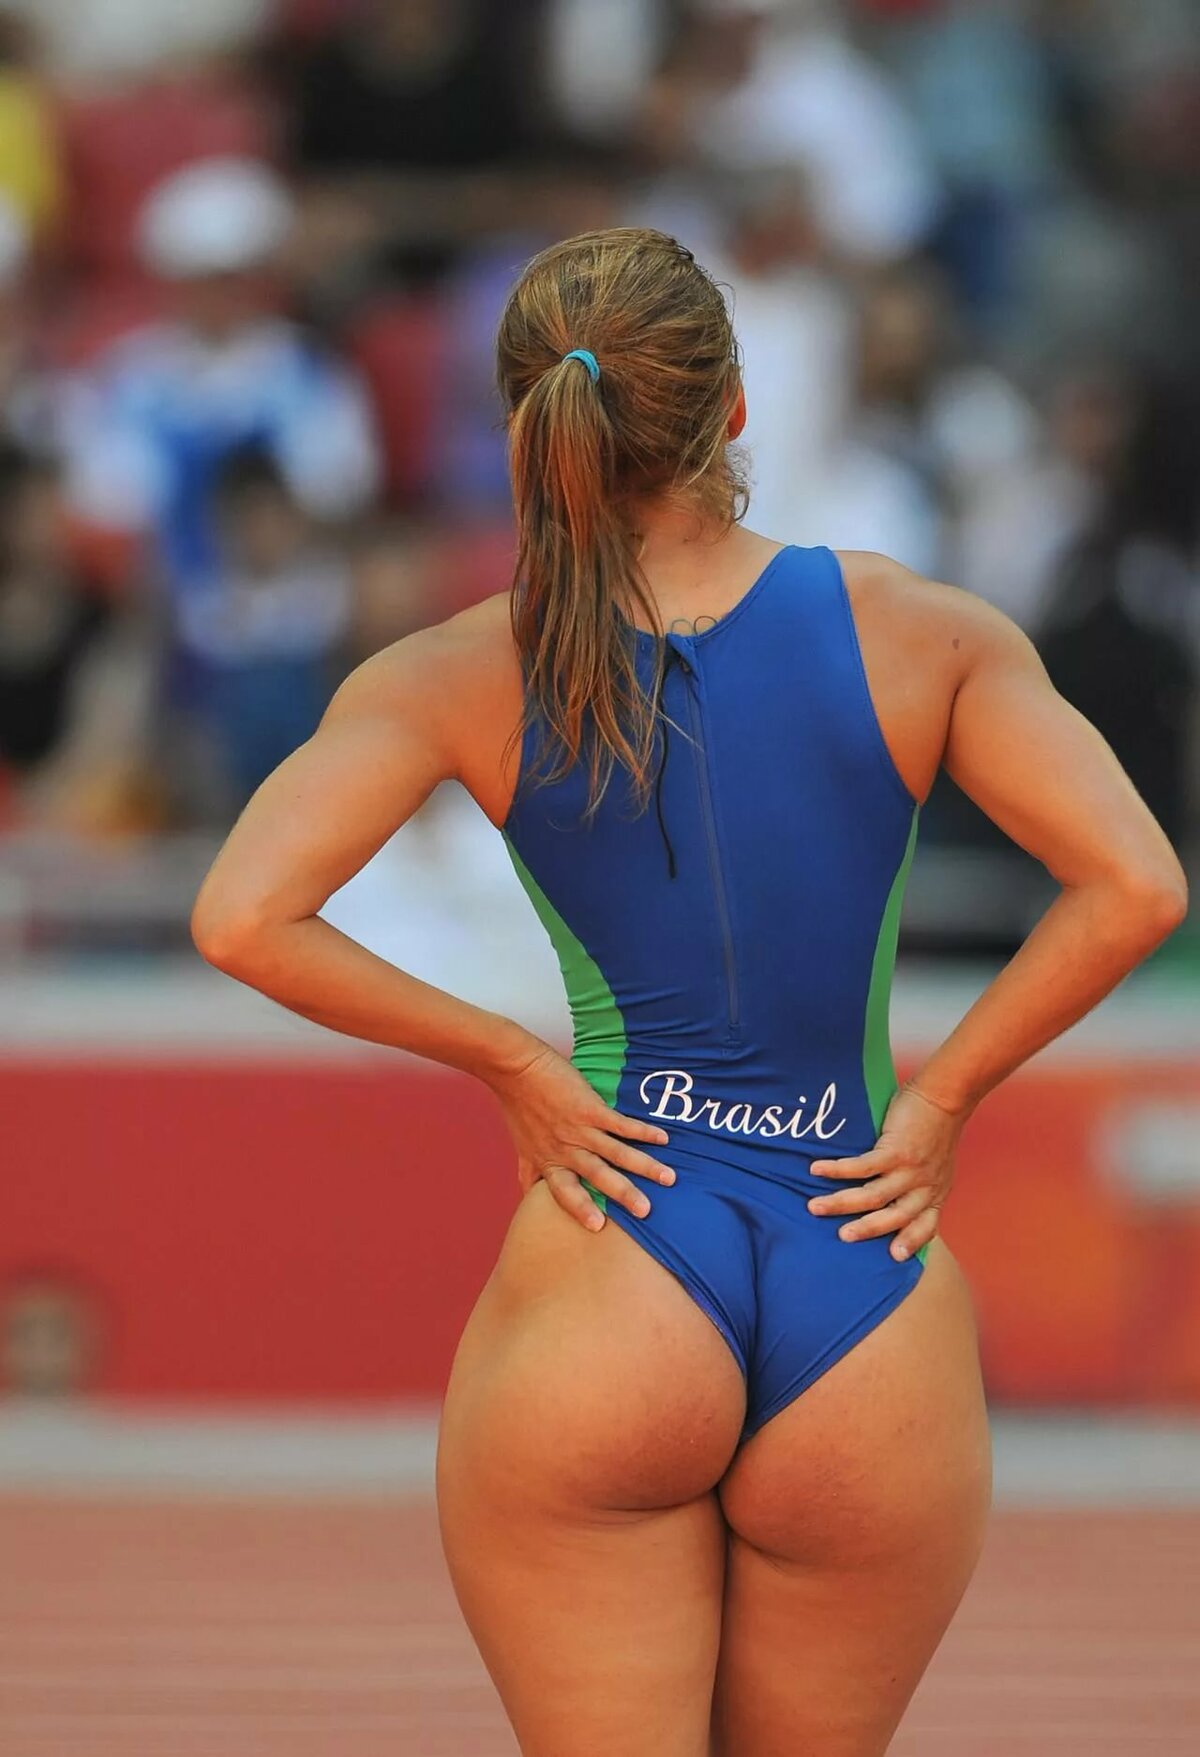 Female athletic butt pics, rachel weisz nude pic